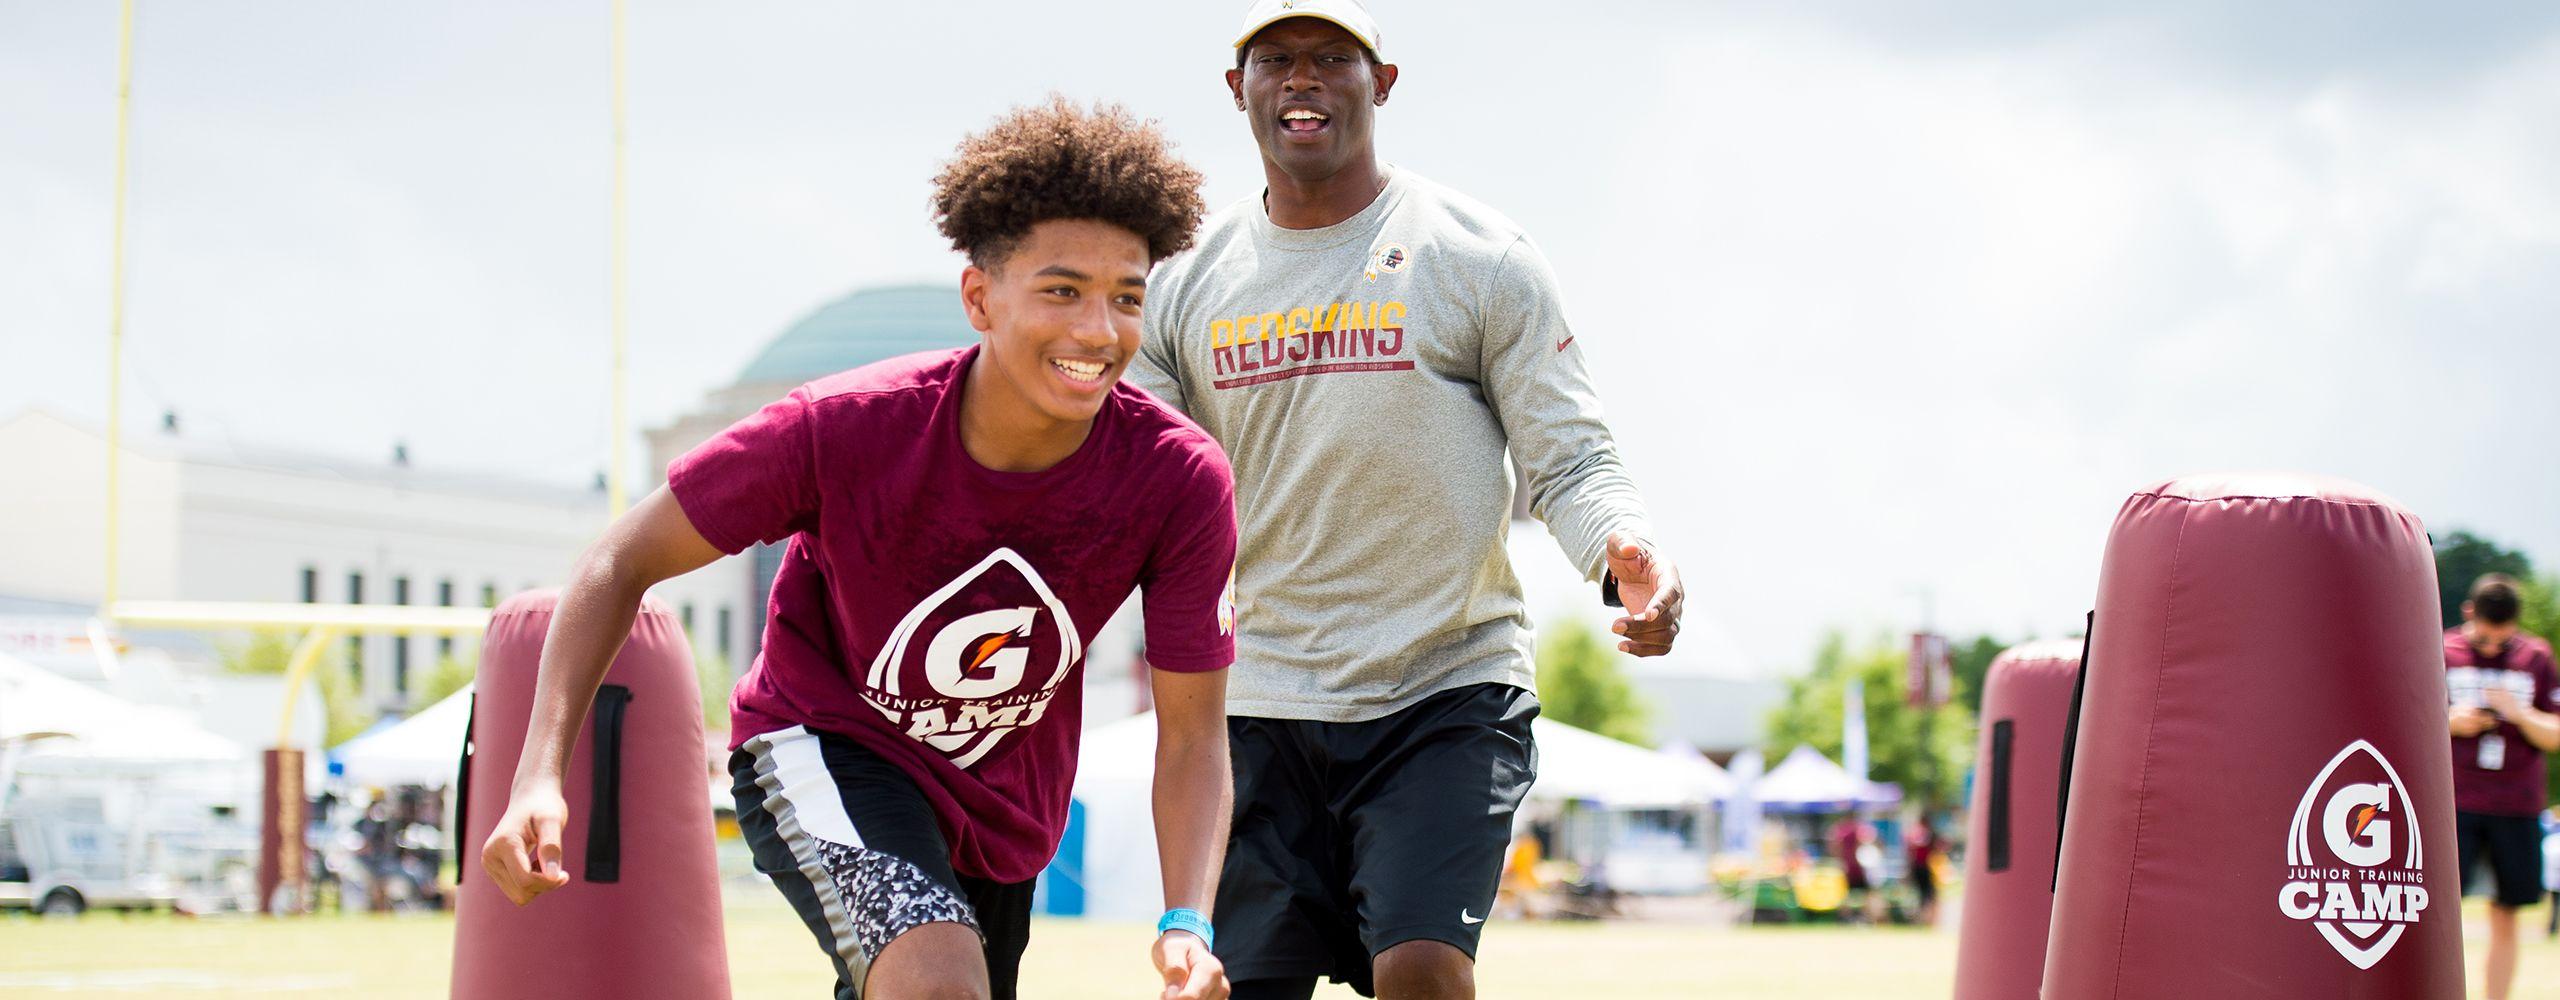 2019-gatorade-junior-training-camp-header